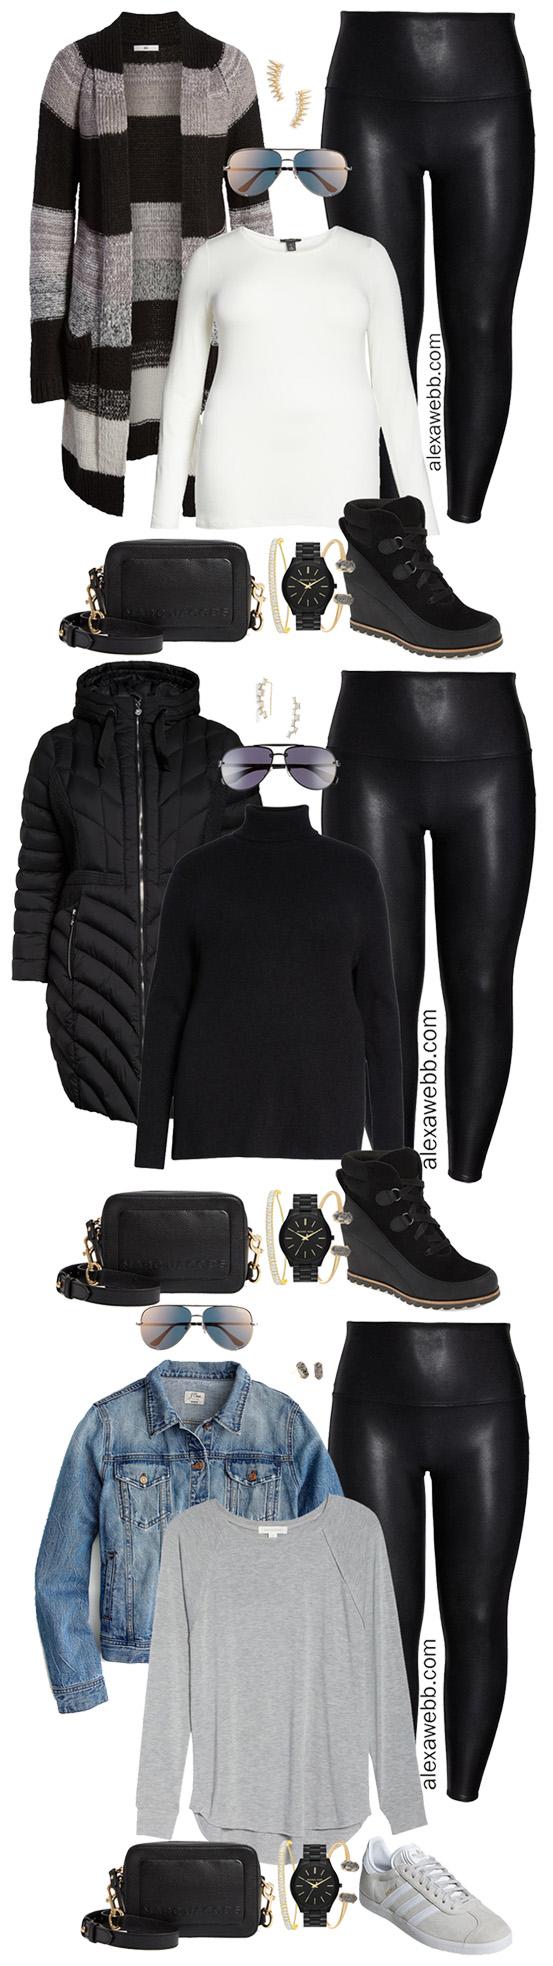 Plus Size Faux Leather Leggings Outfits - Plus Size Striped Cardigan, T-Shirt, Leggings, Booties, Crossbody Bag, Aviator Sunglasses - Plus Size Fashion for Women - alexawebb.com #plussize #alexawebb #NSale